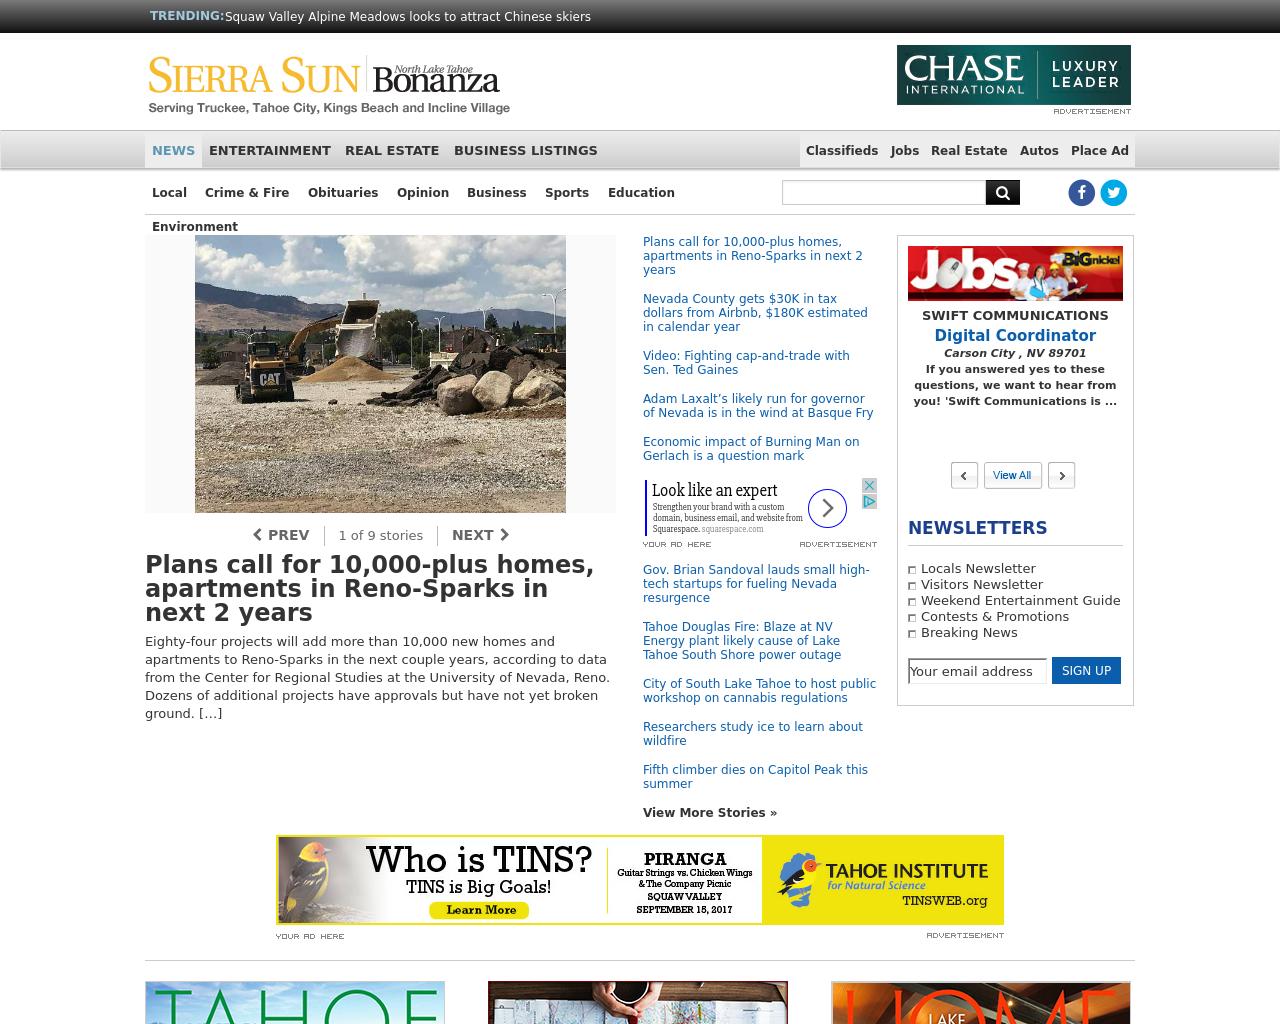 Sierra-Sun-l-North-Lake-Tahoe-Bonanza-Advertising-Reviews-Pricing